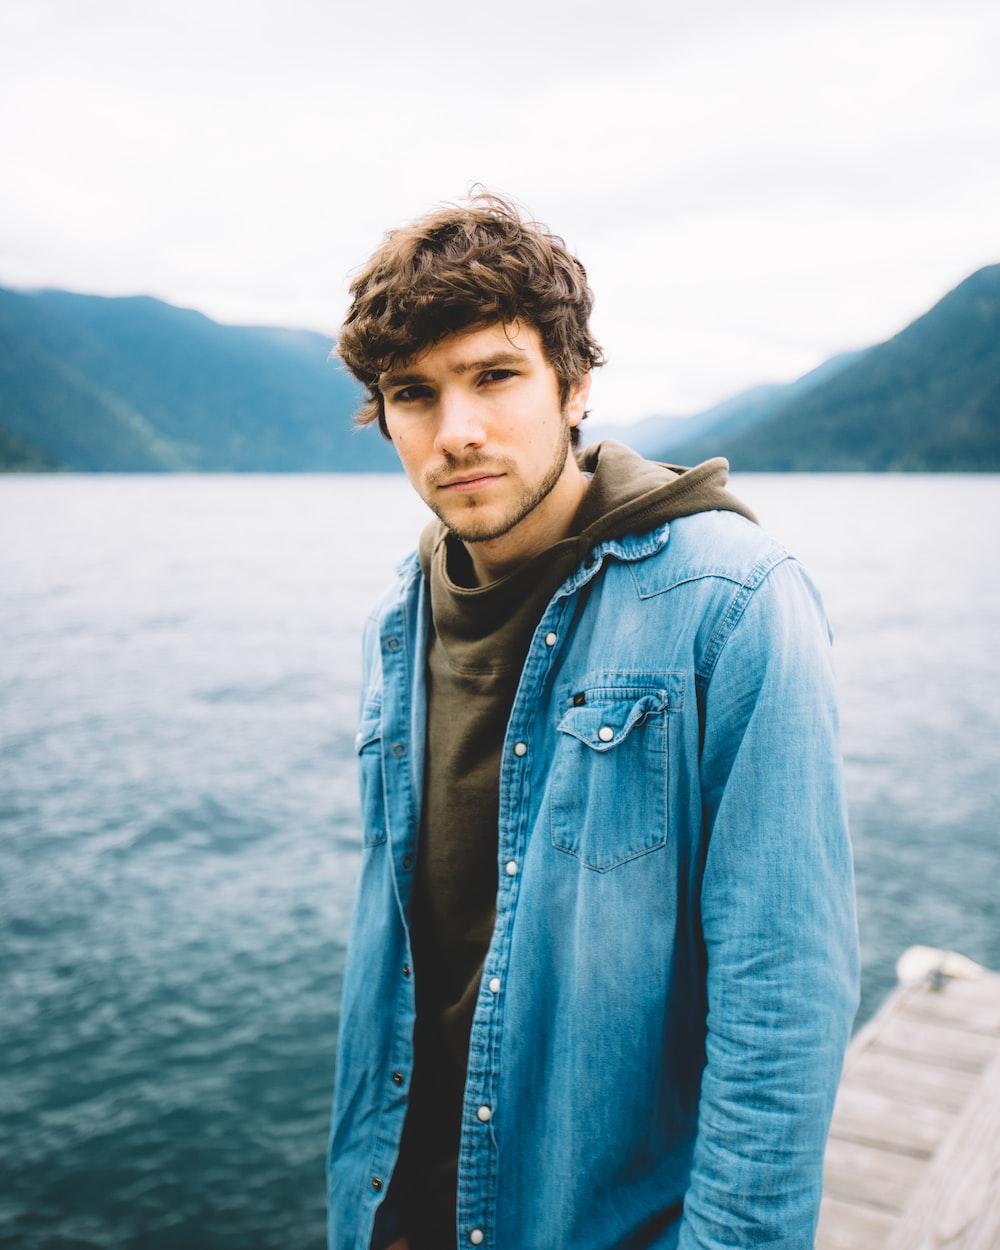 man in blue denim jacket standing near body of water during daytime